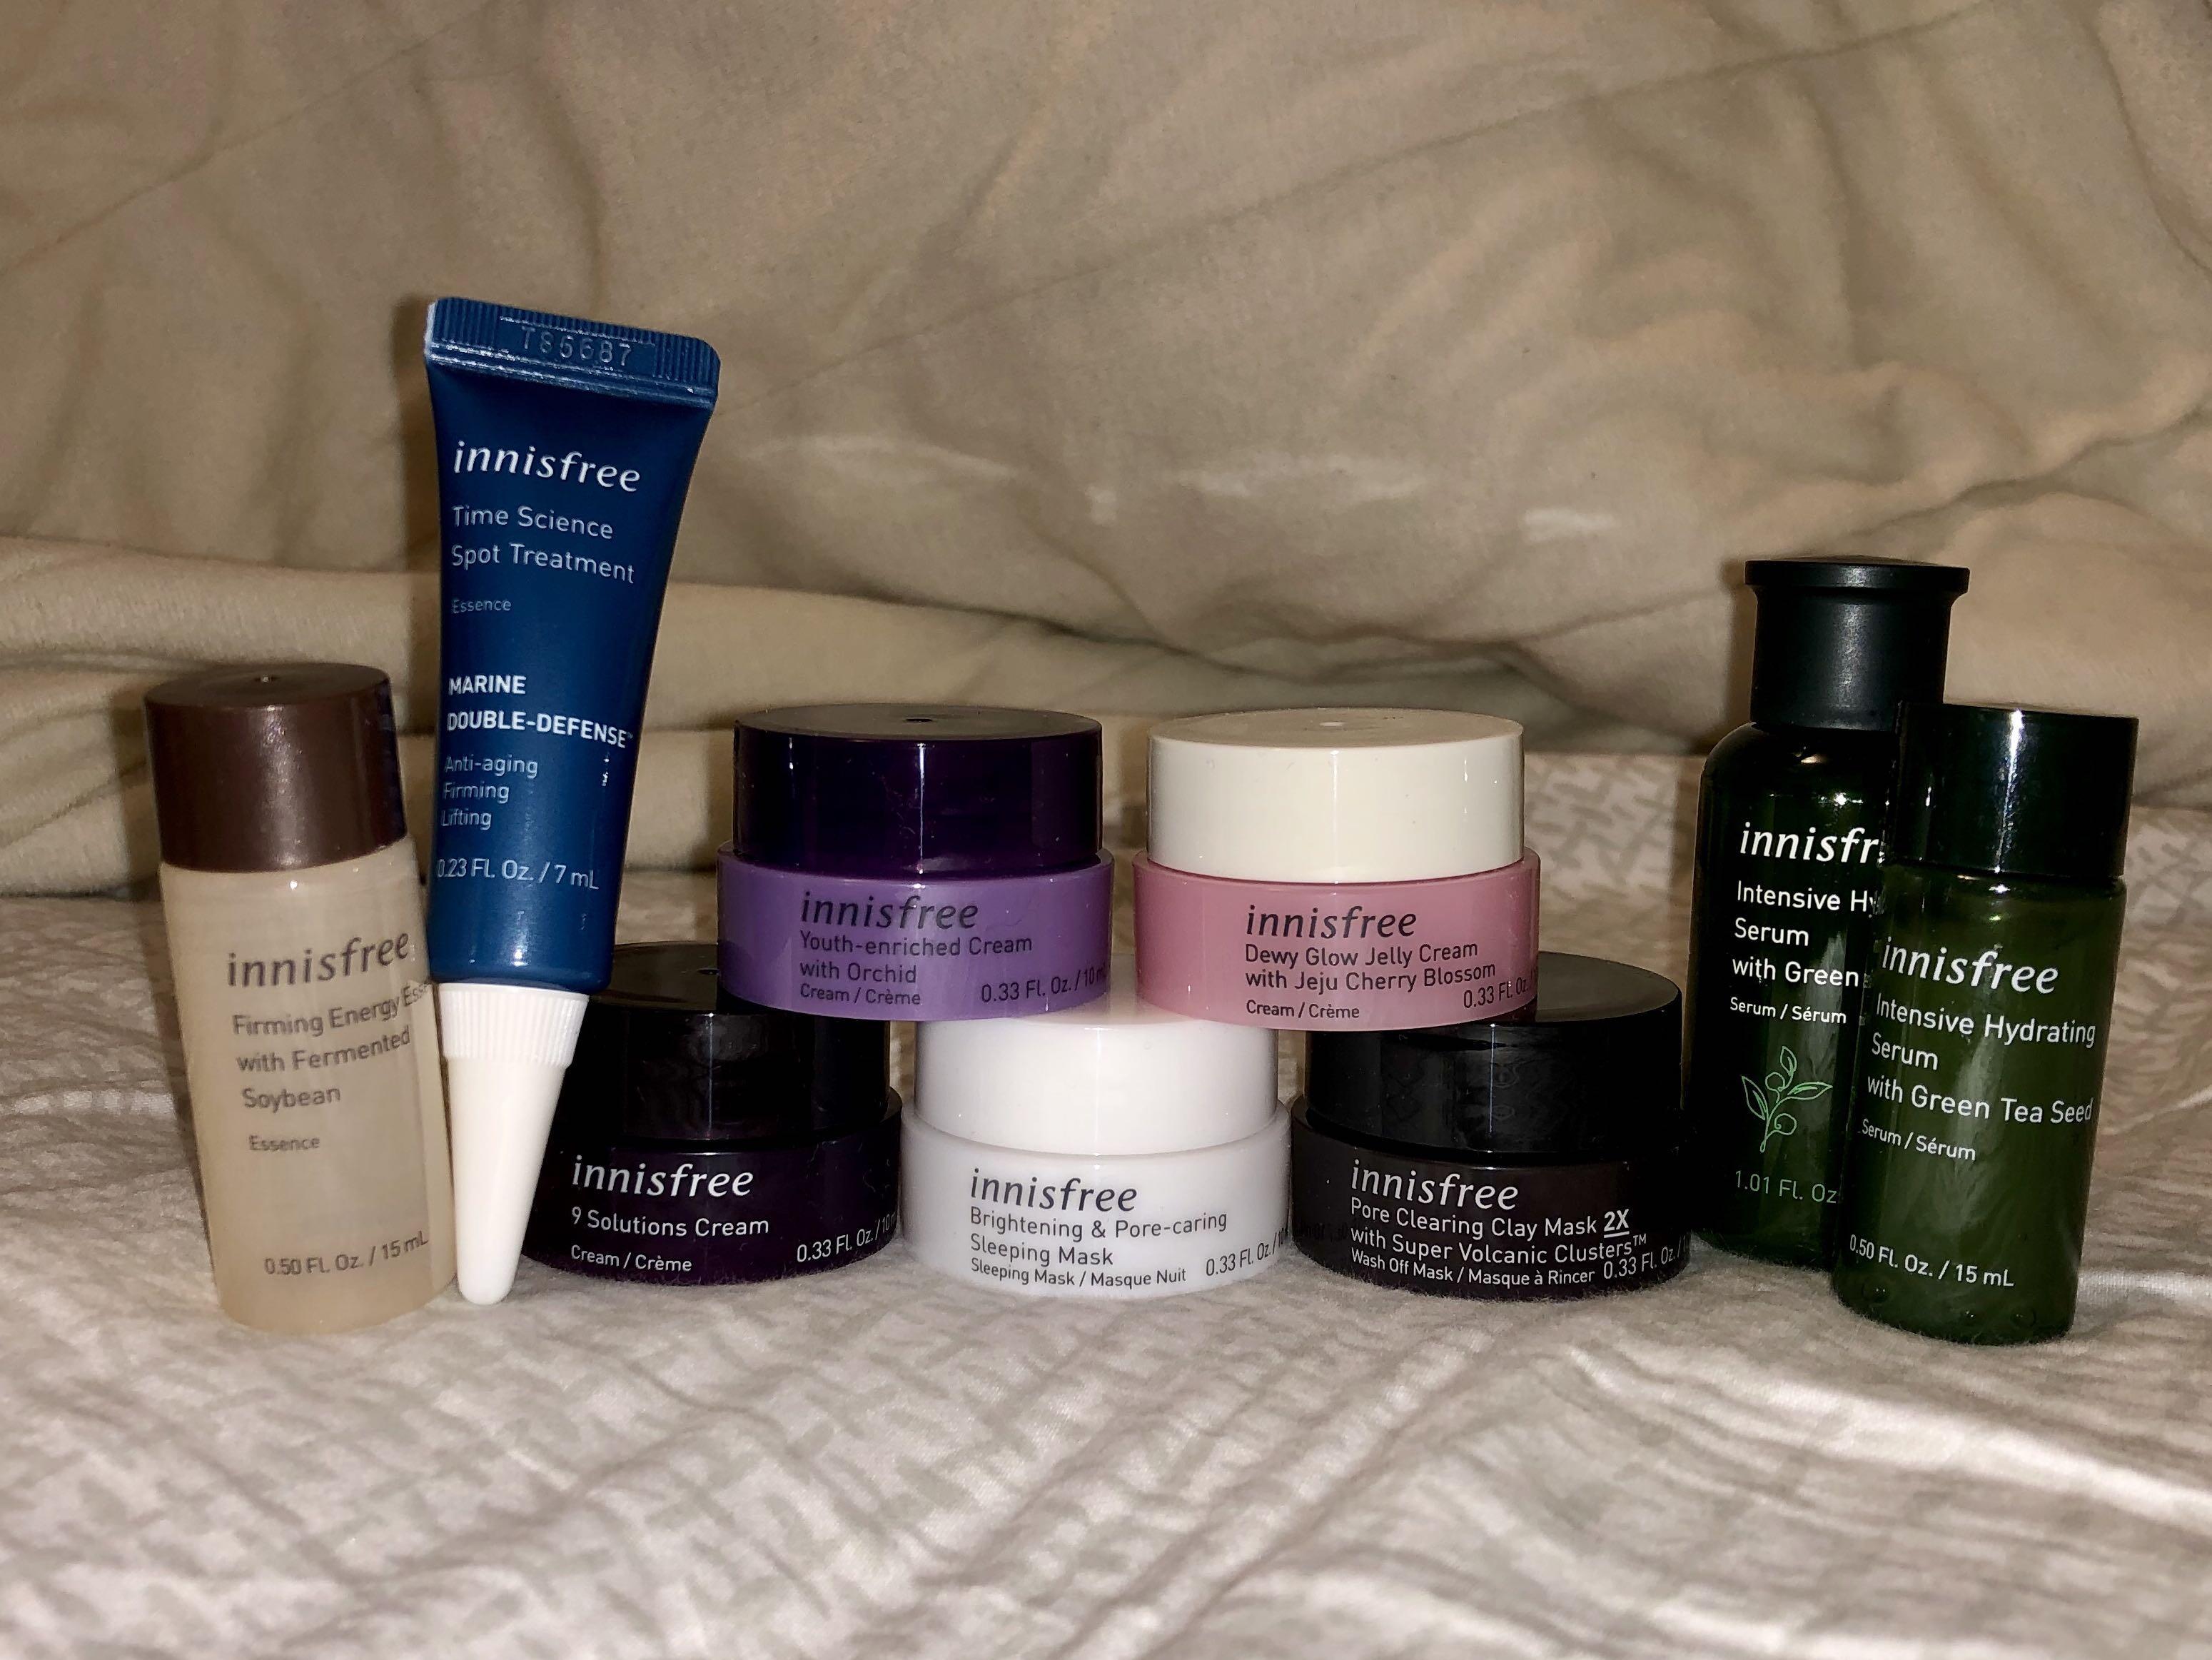 Innisfree skincare (all of them)